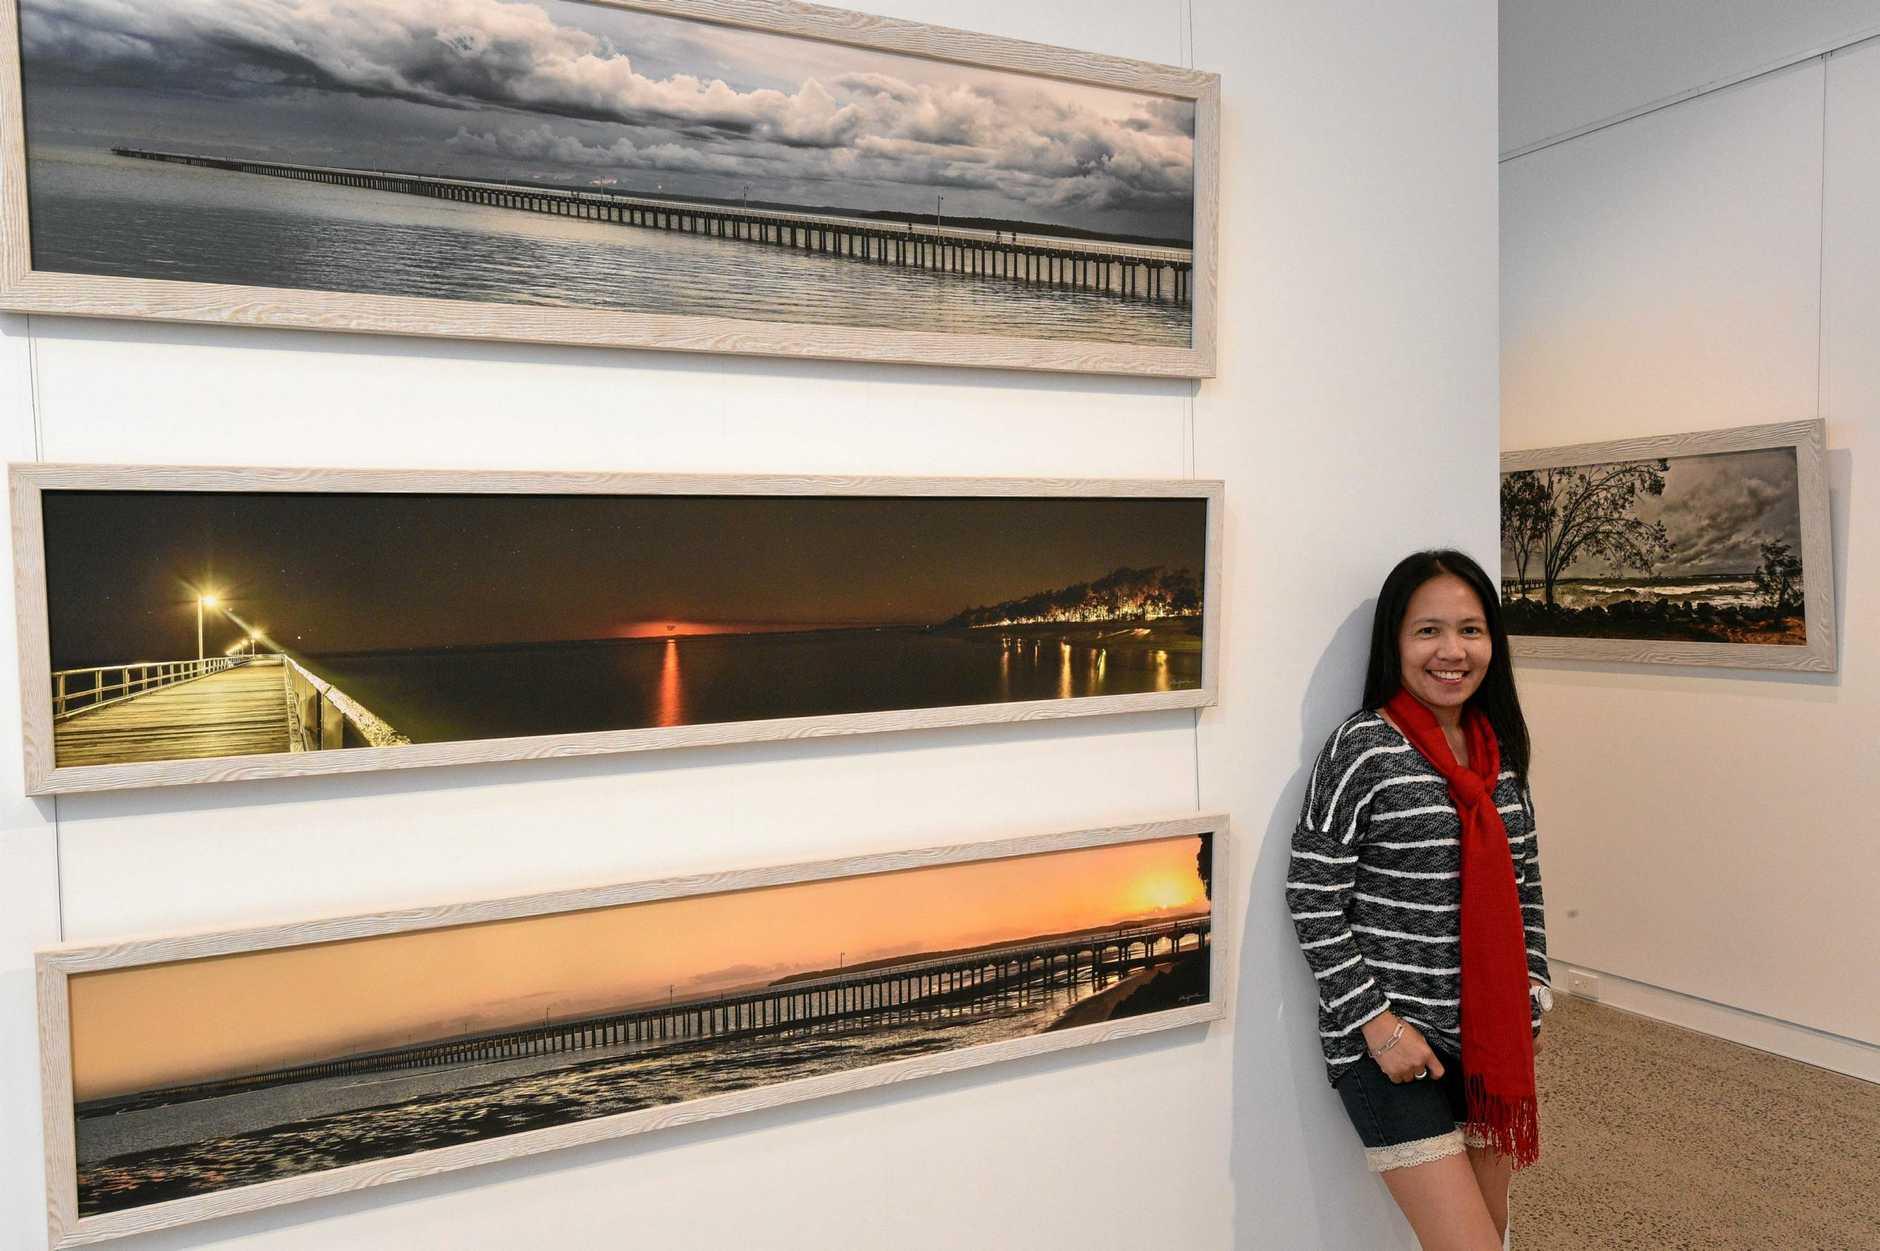 Hervey Bay Regional Gallery - photographer Ellen Foulds with her exhibition